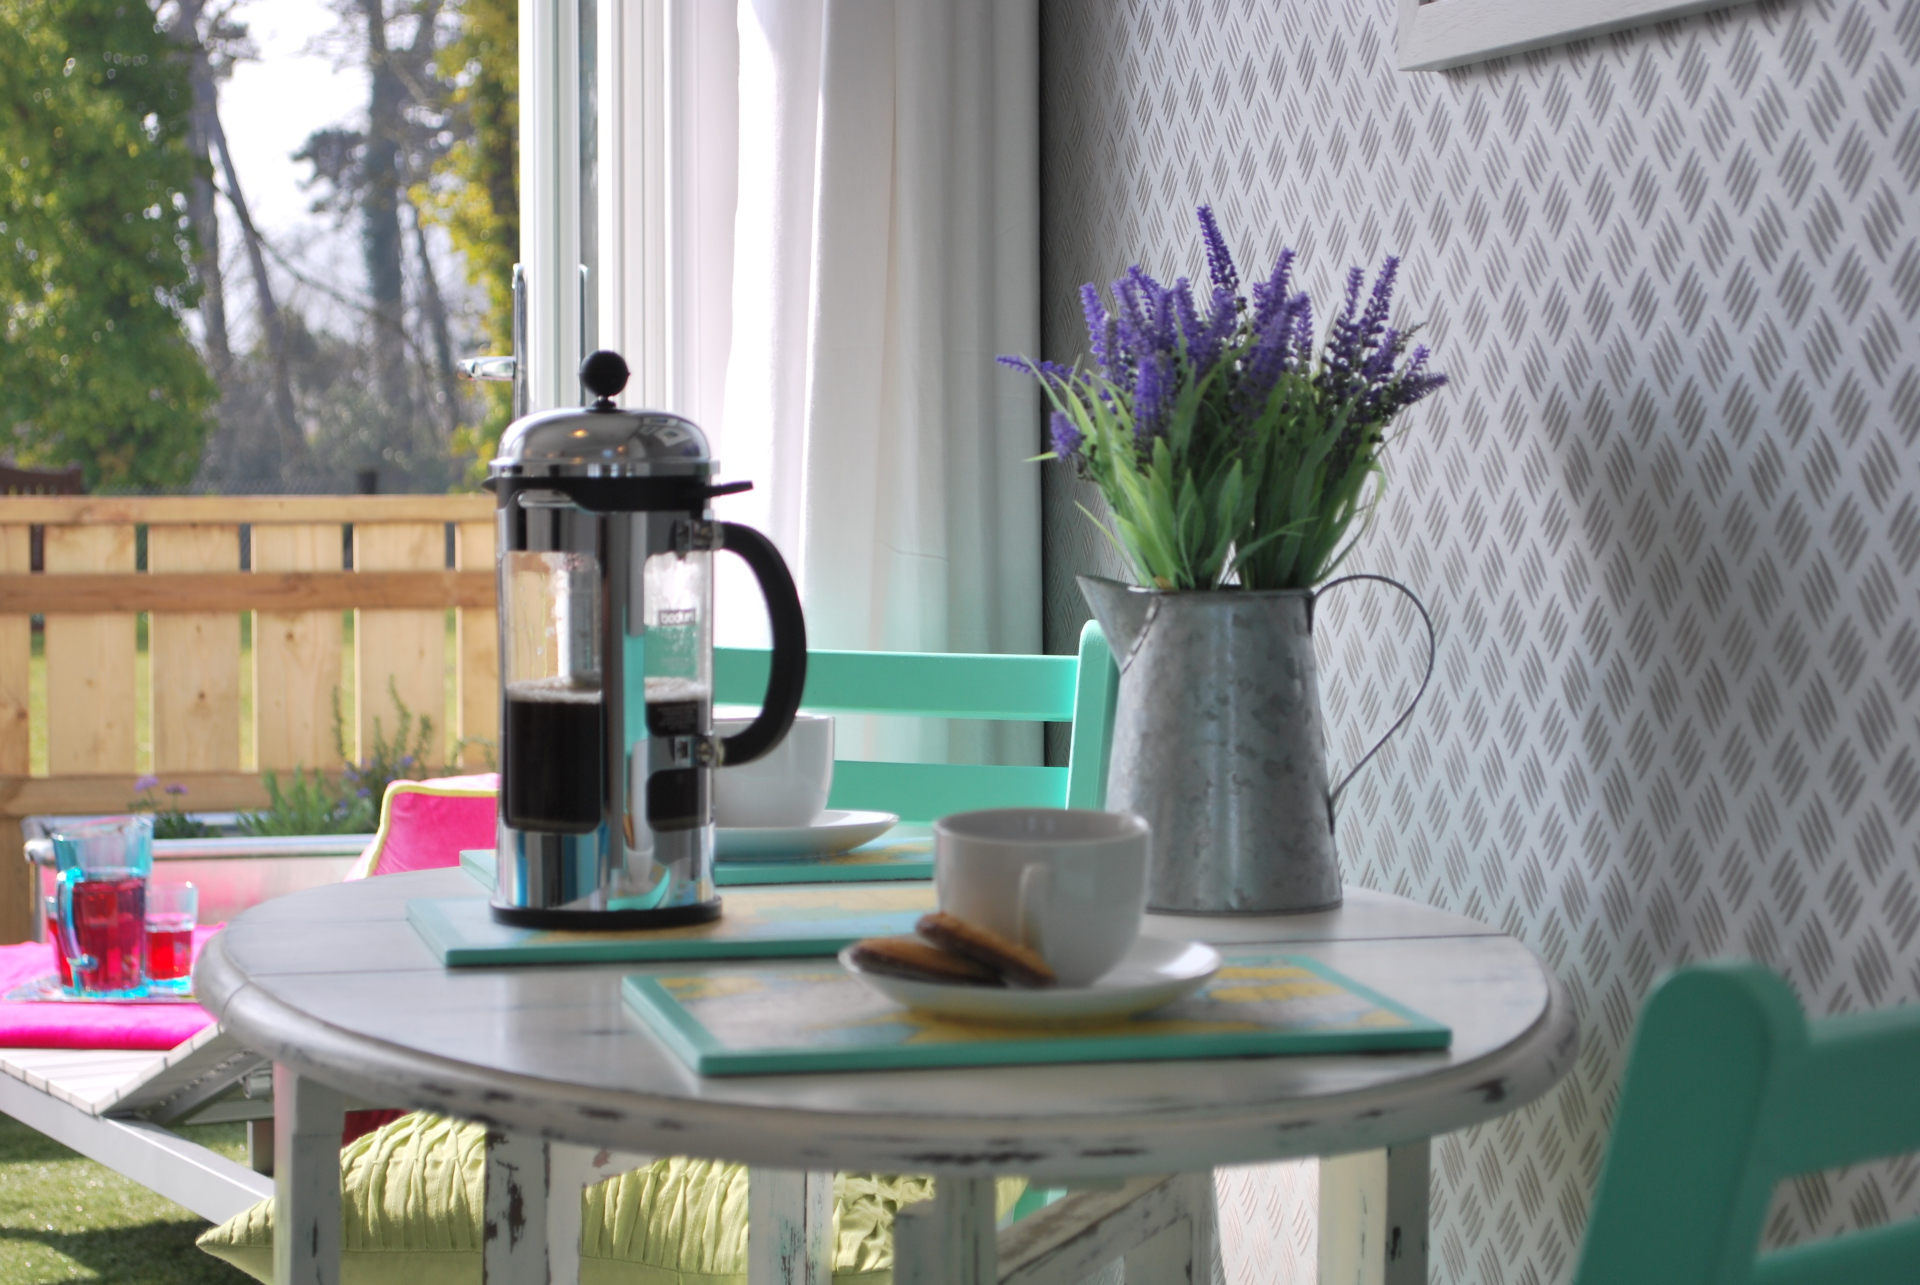 Dunster, luxury, Beach, hut, Salad, Days, coffee, lavender, fresh, relax, view